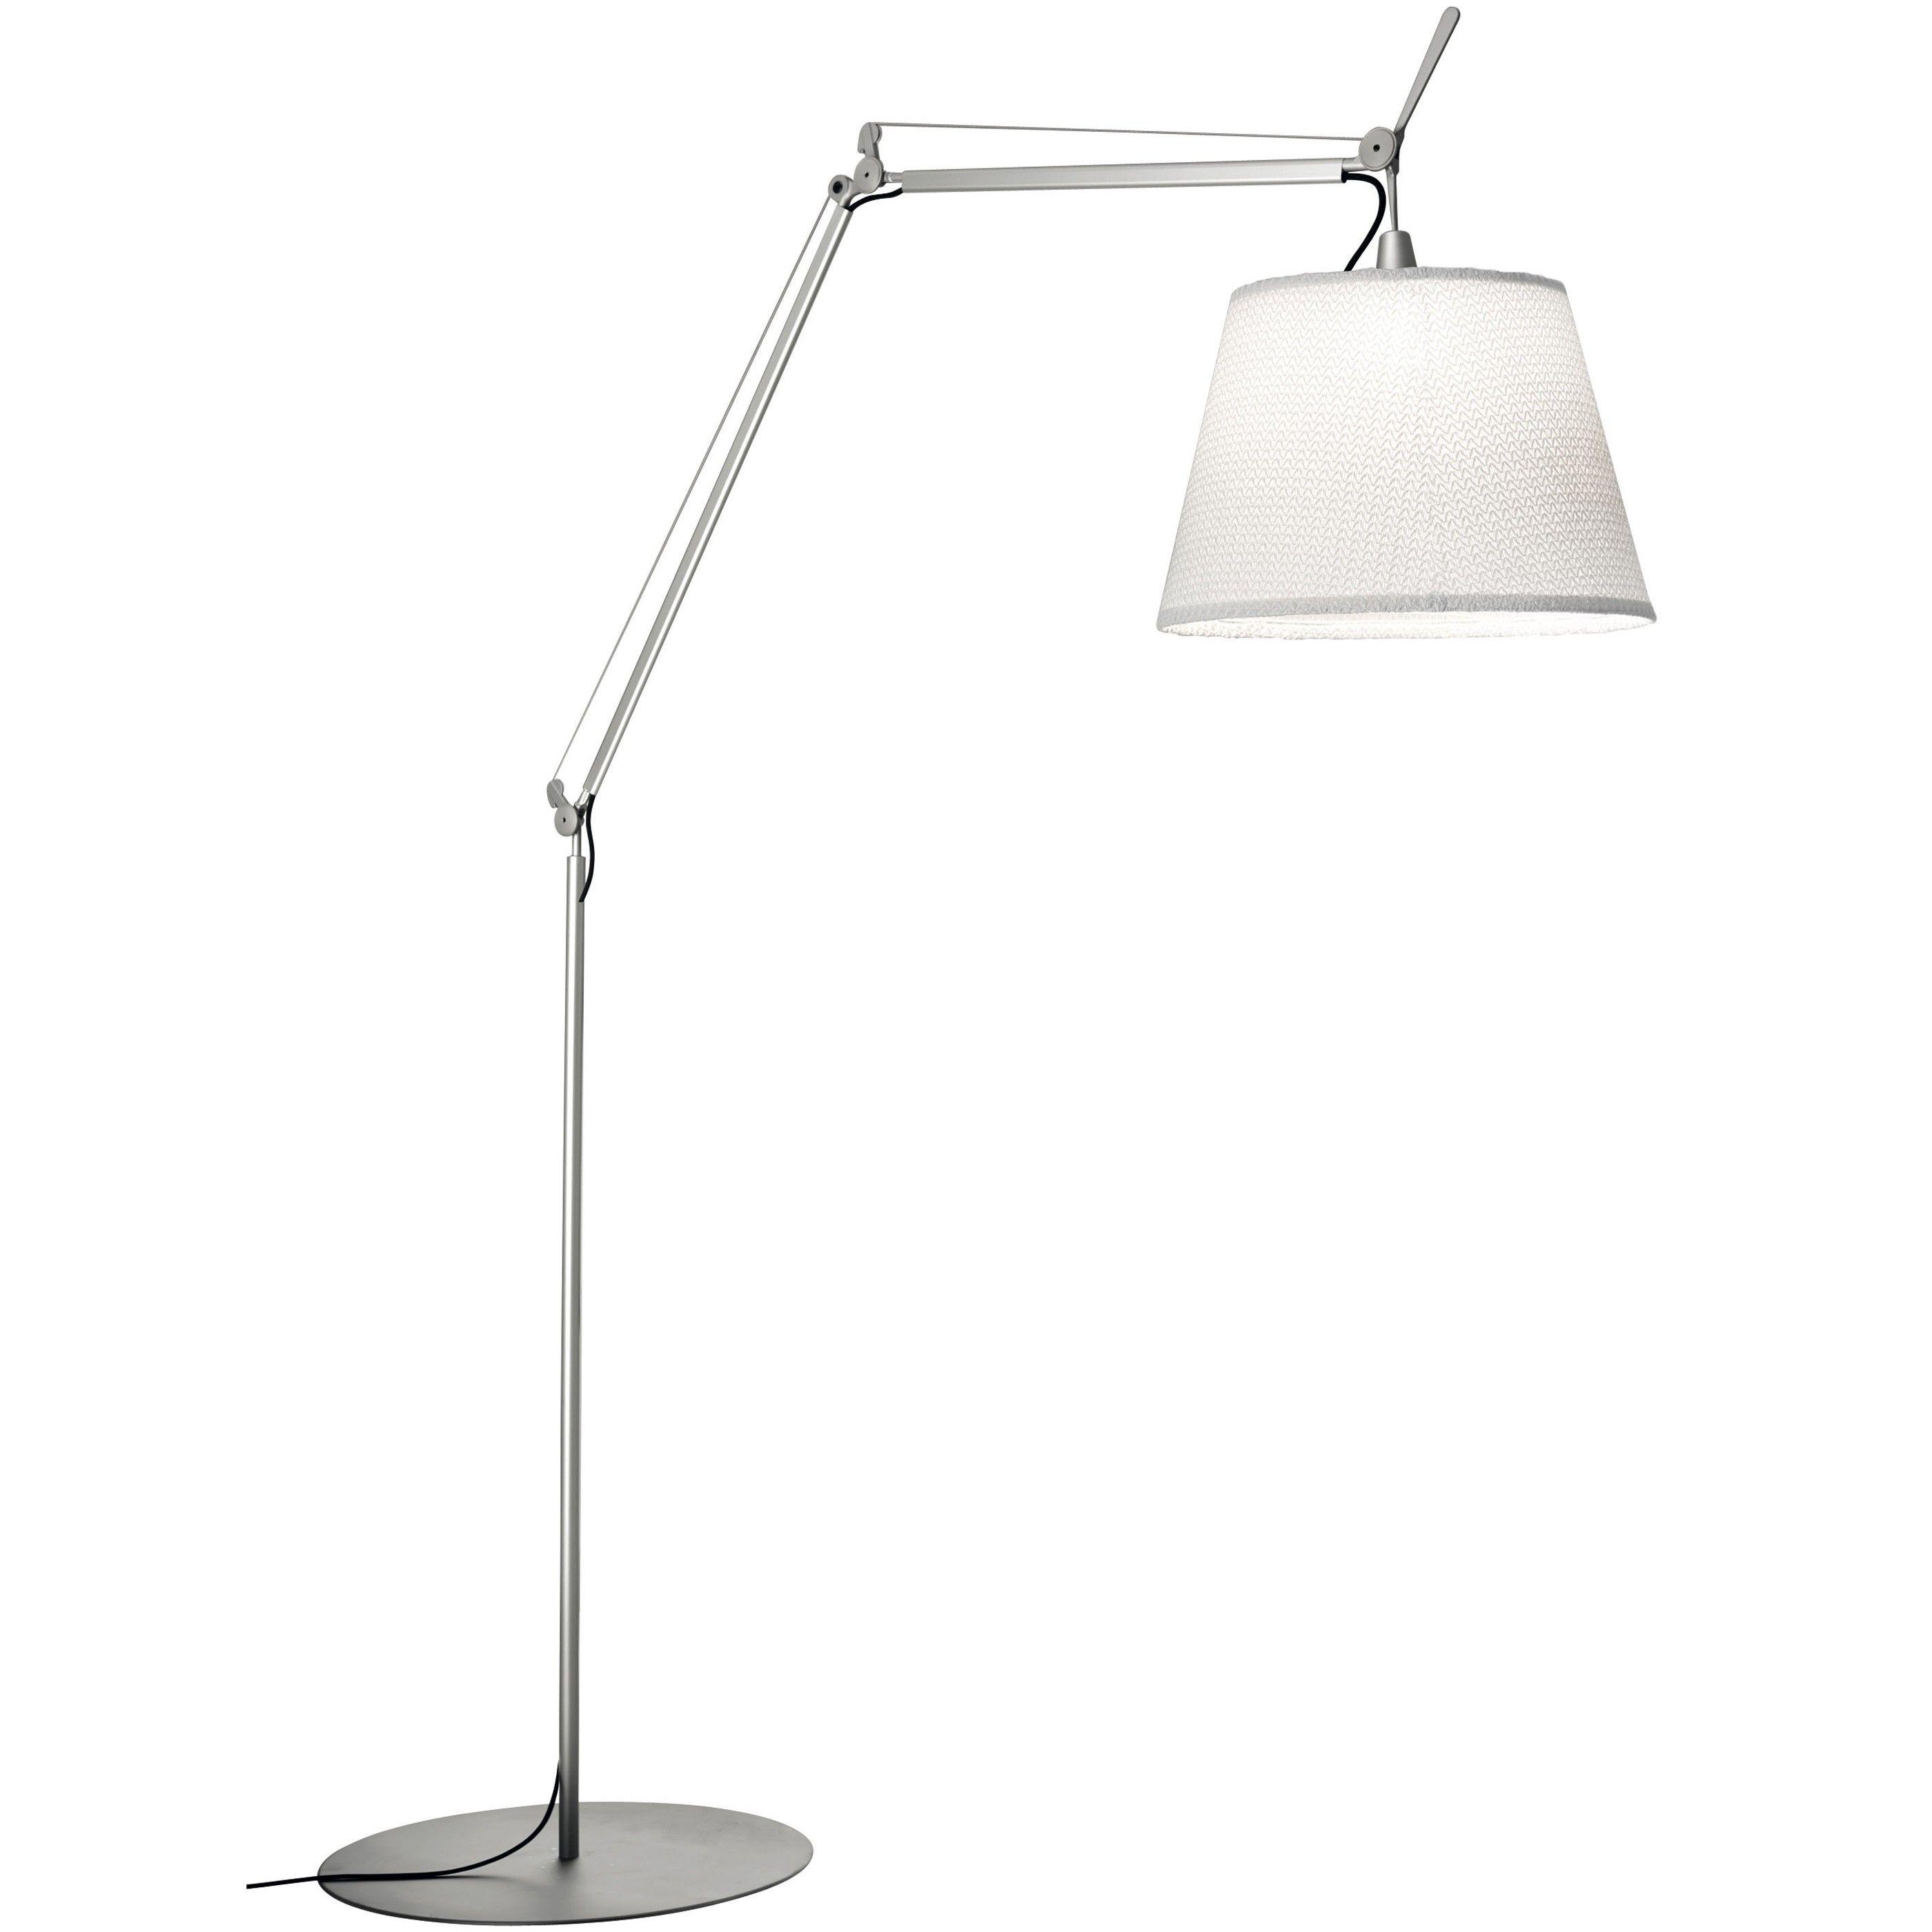 Artemide Tolomeo Vloerlamp.Artemide Tolomeo Paralume Outdoor Vloerlamp Led